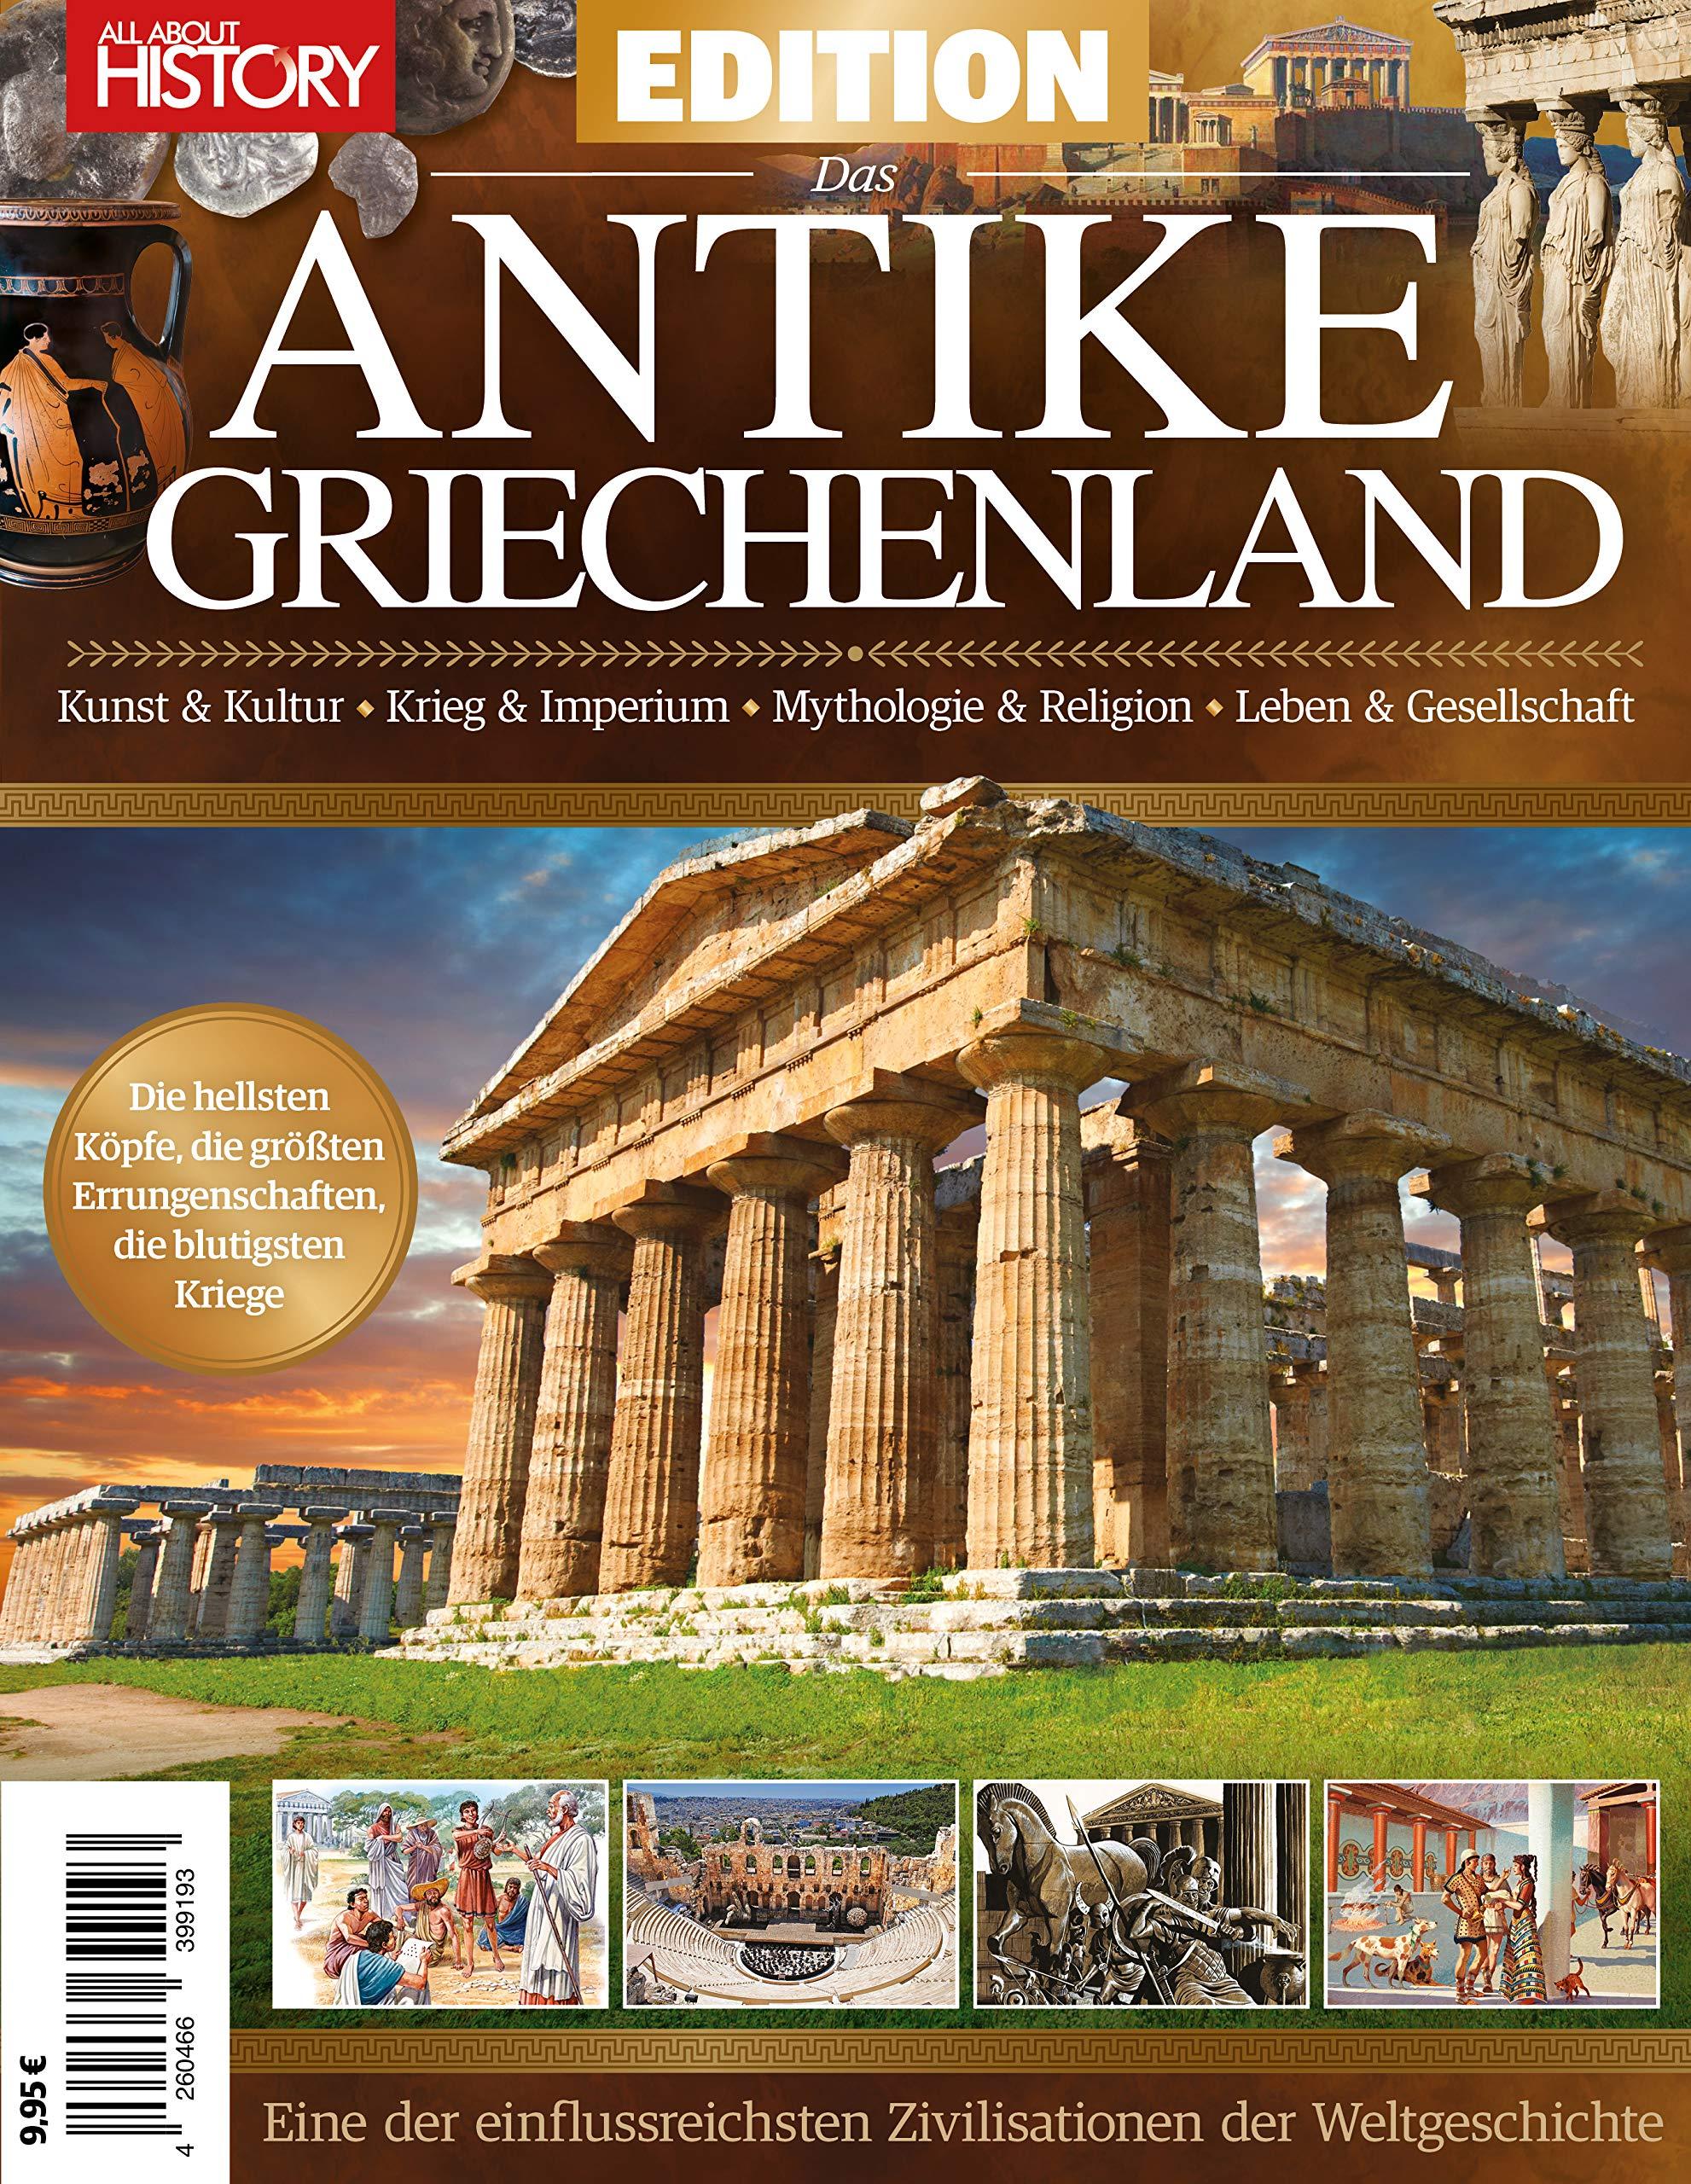 All About History EDITION: Das Antike Griechenland: Kunst & Kultur Krieg & Imperium Mythologie & Religion Leben & Gesellschaft